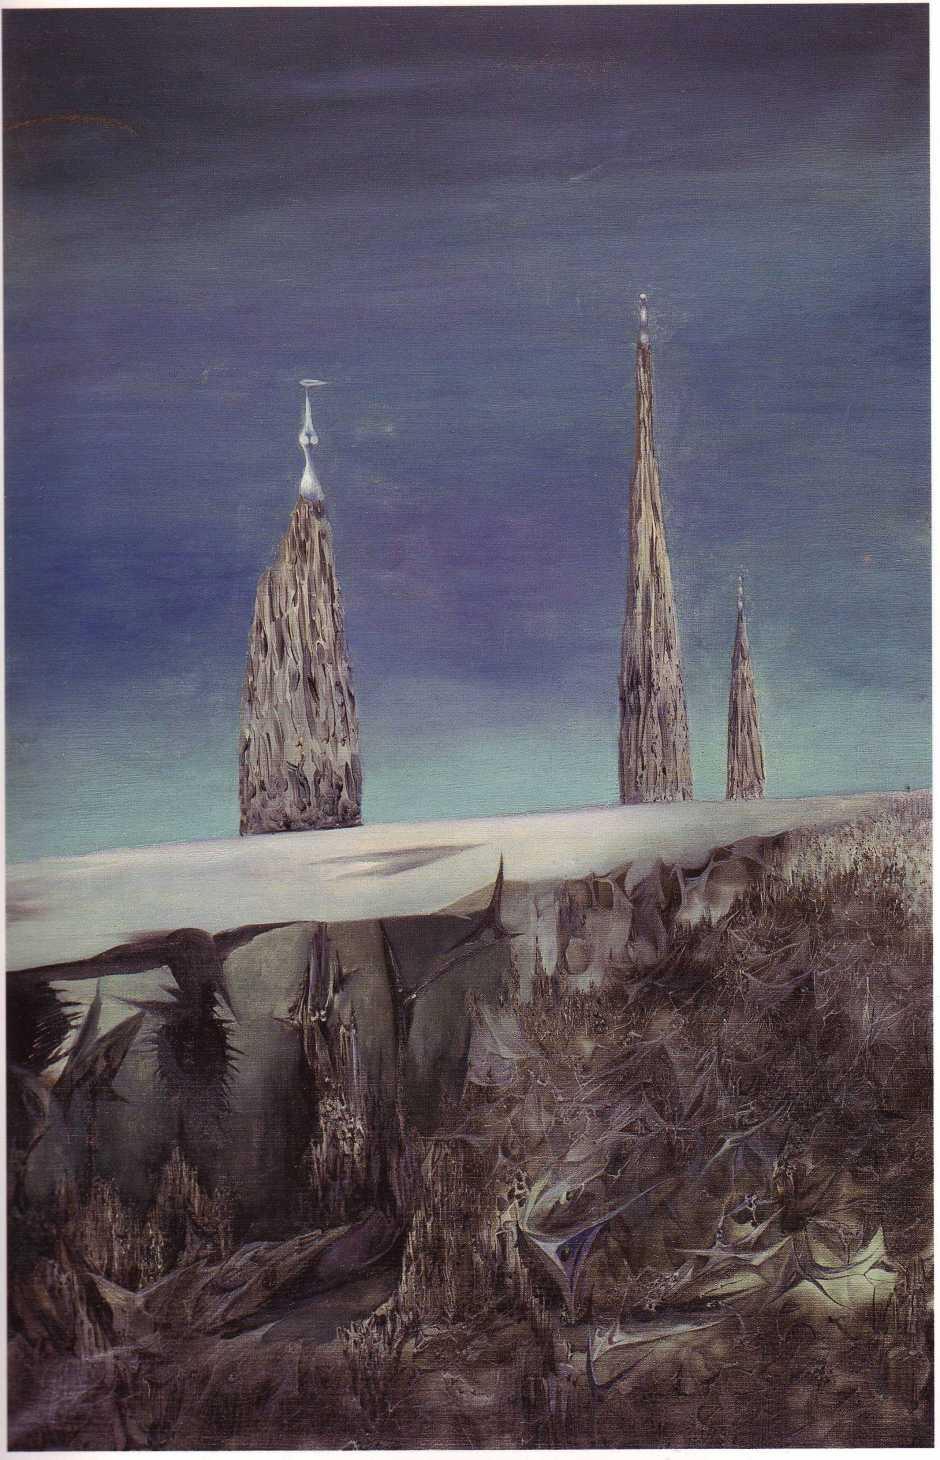 Wolfgang Paalen, Fata Alaska, 1937